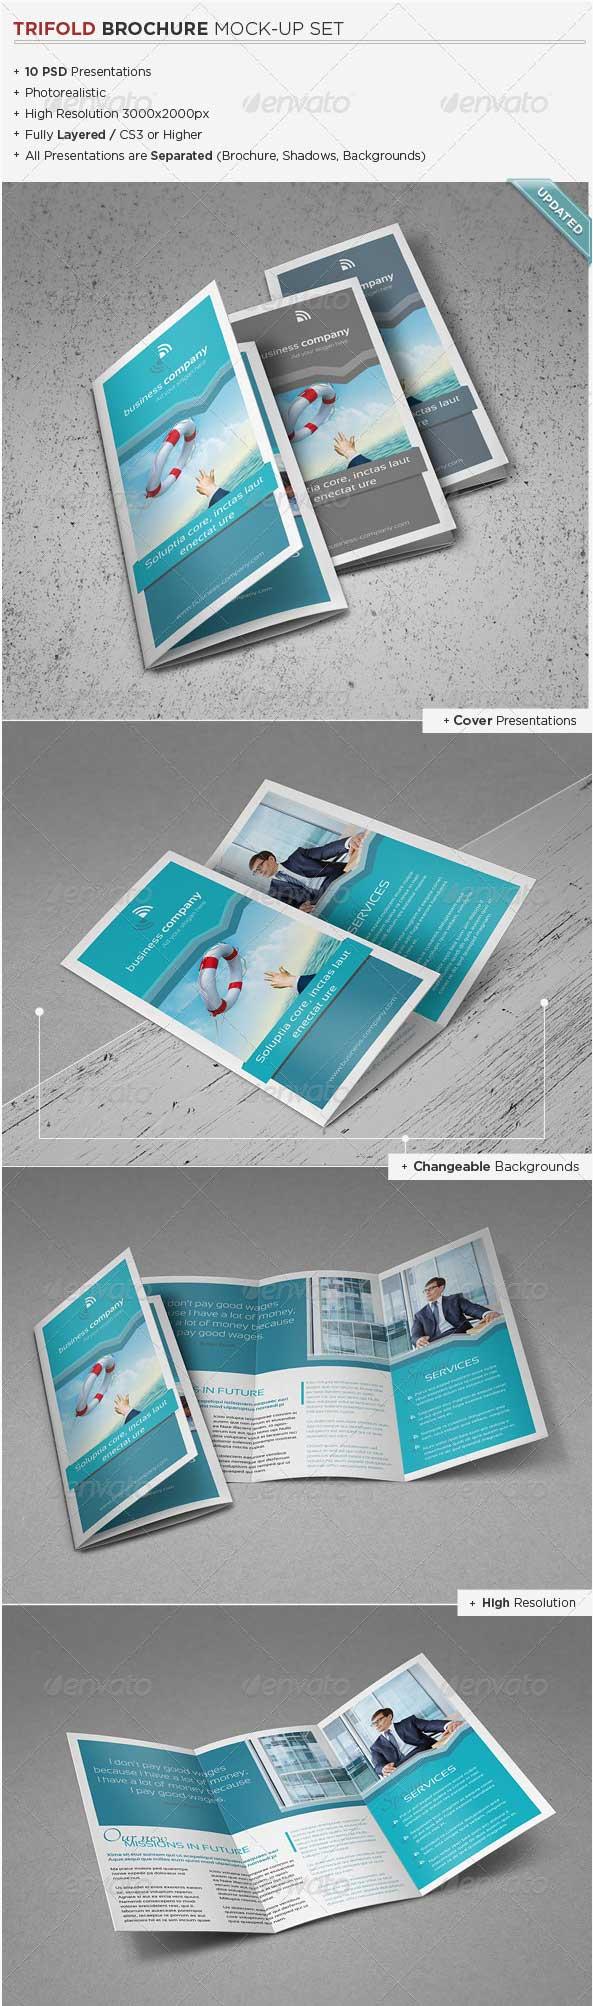 trifold-brochure-mockup-psd